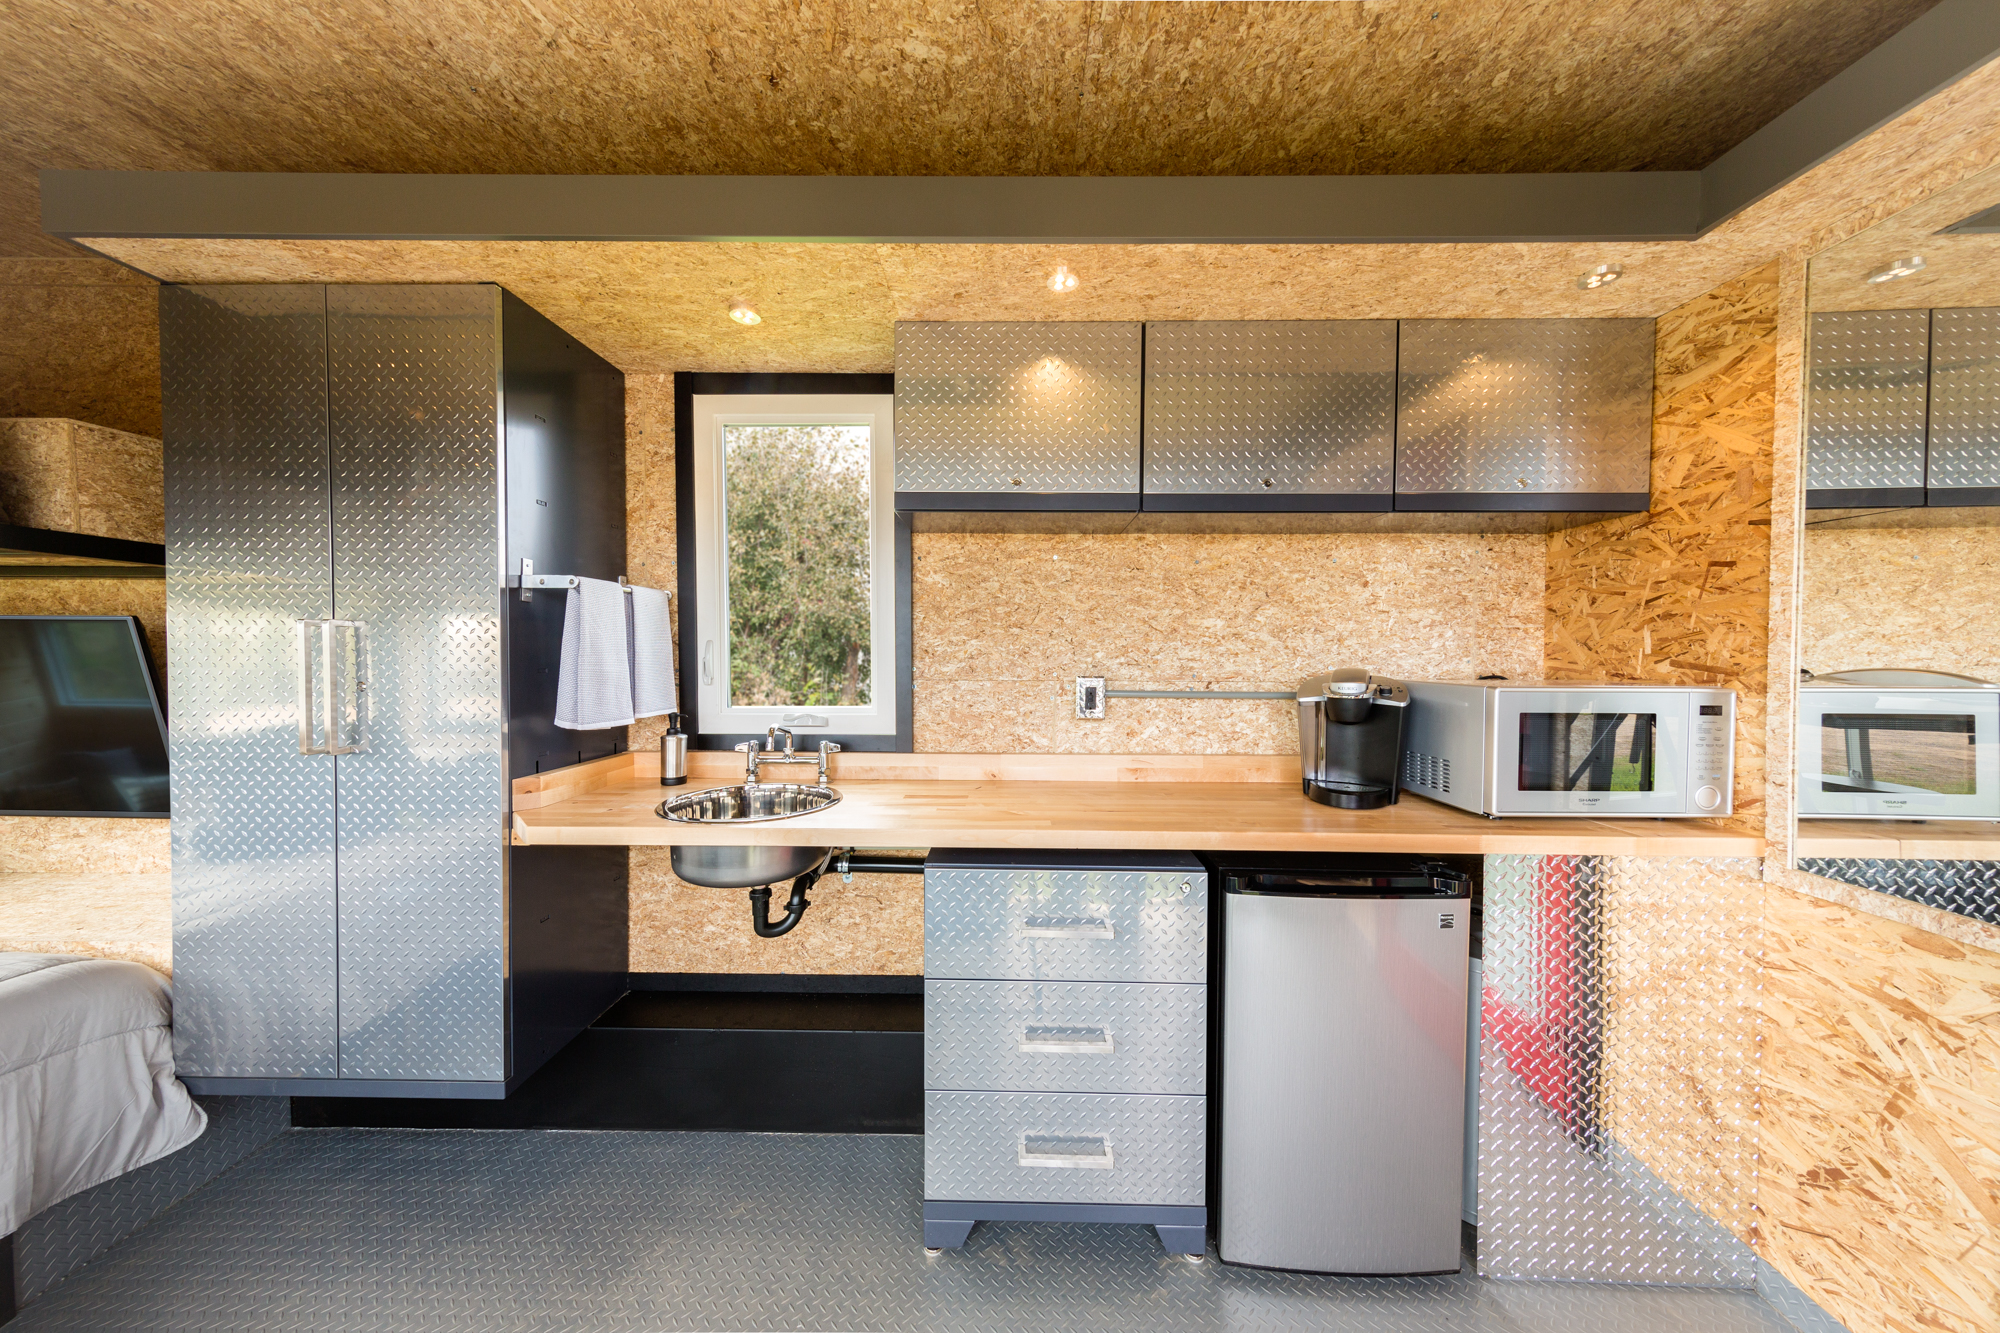 escape sport the ultimate man cave on wheels diamond kitchen cabinets ESCAPE Sport kitchen